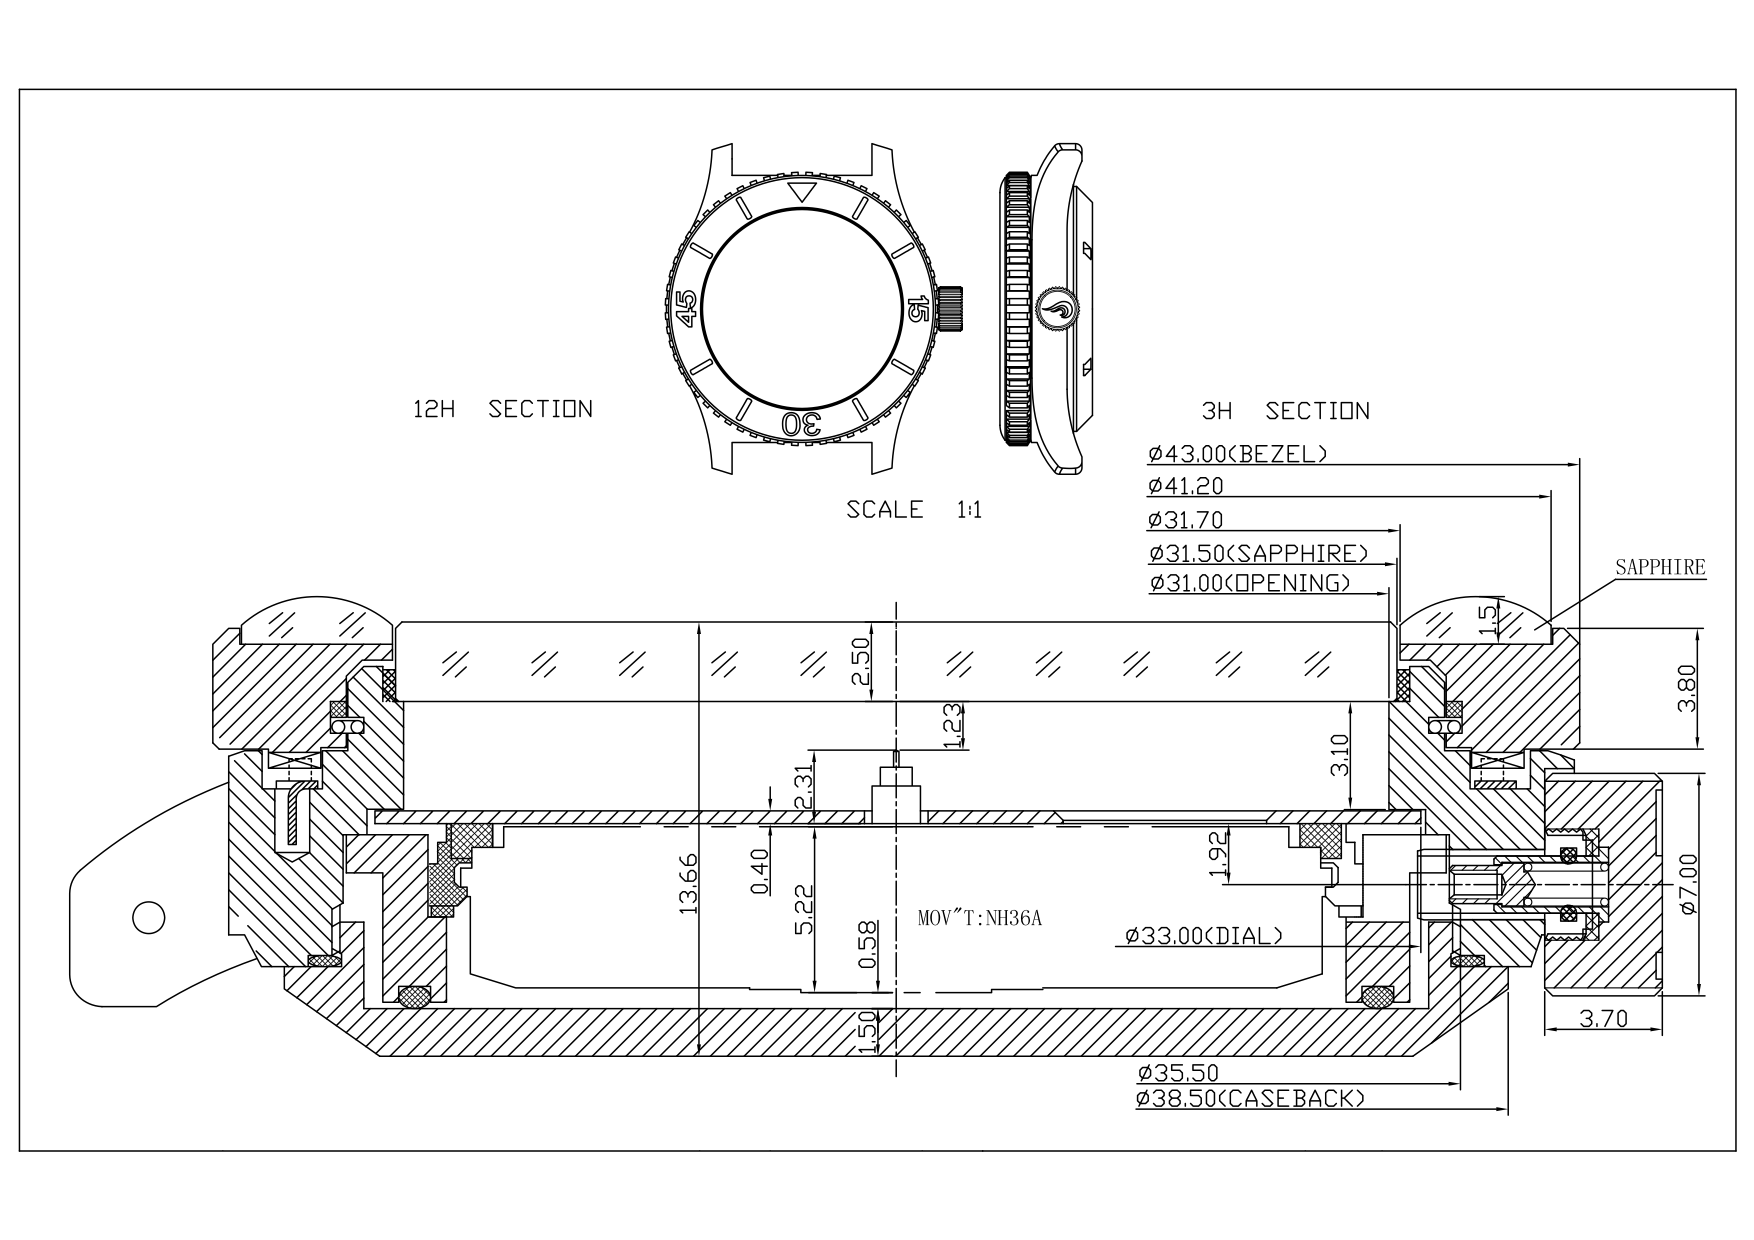 Technical Drawing Of The Prometheus Sailfish Automatic